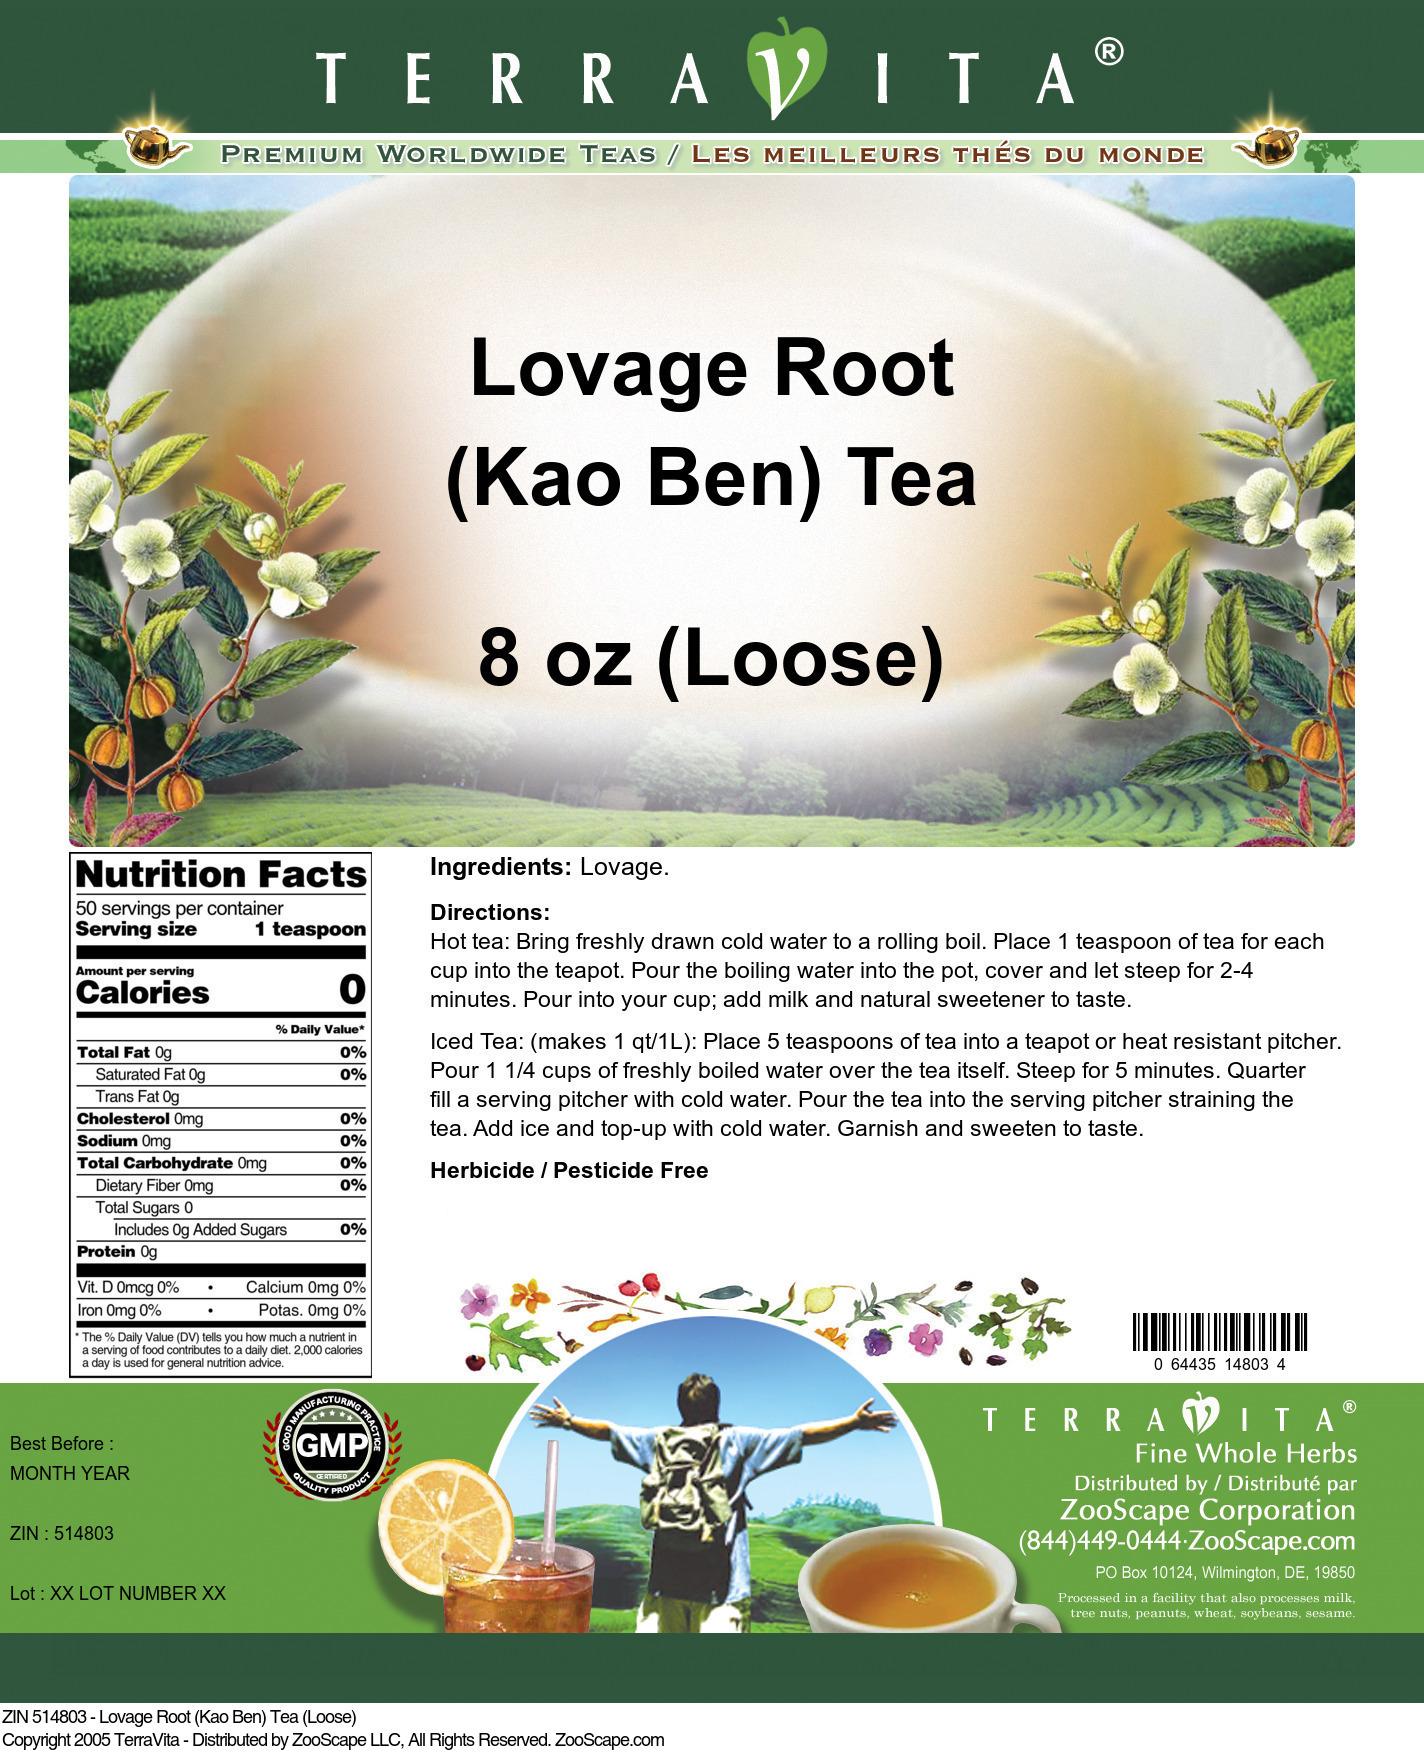 Lovage Root (Kao Ben) Tea (Loose)